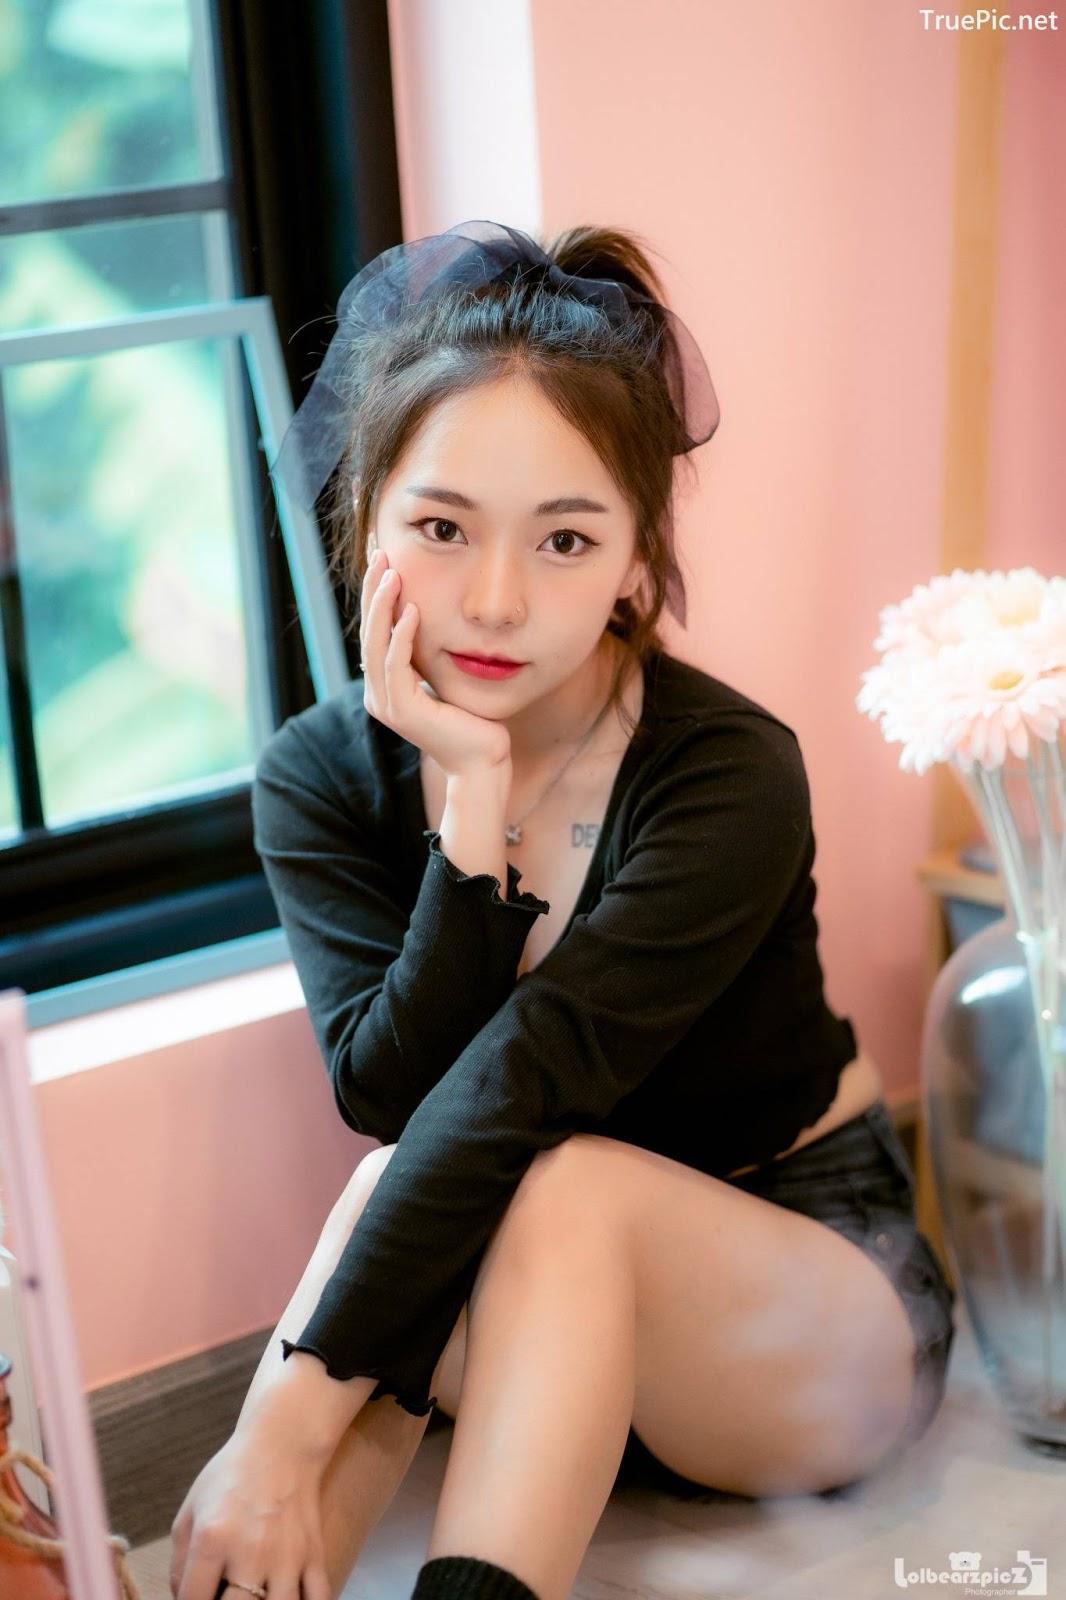 Image Thailand Model - Sunna Dewa - Cute Naughty Girl - TruePic.net - Picture-2